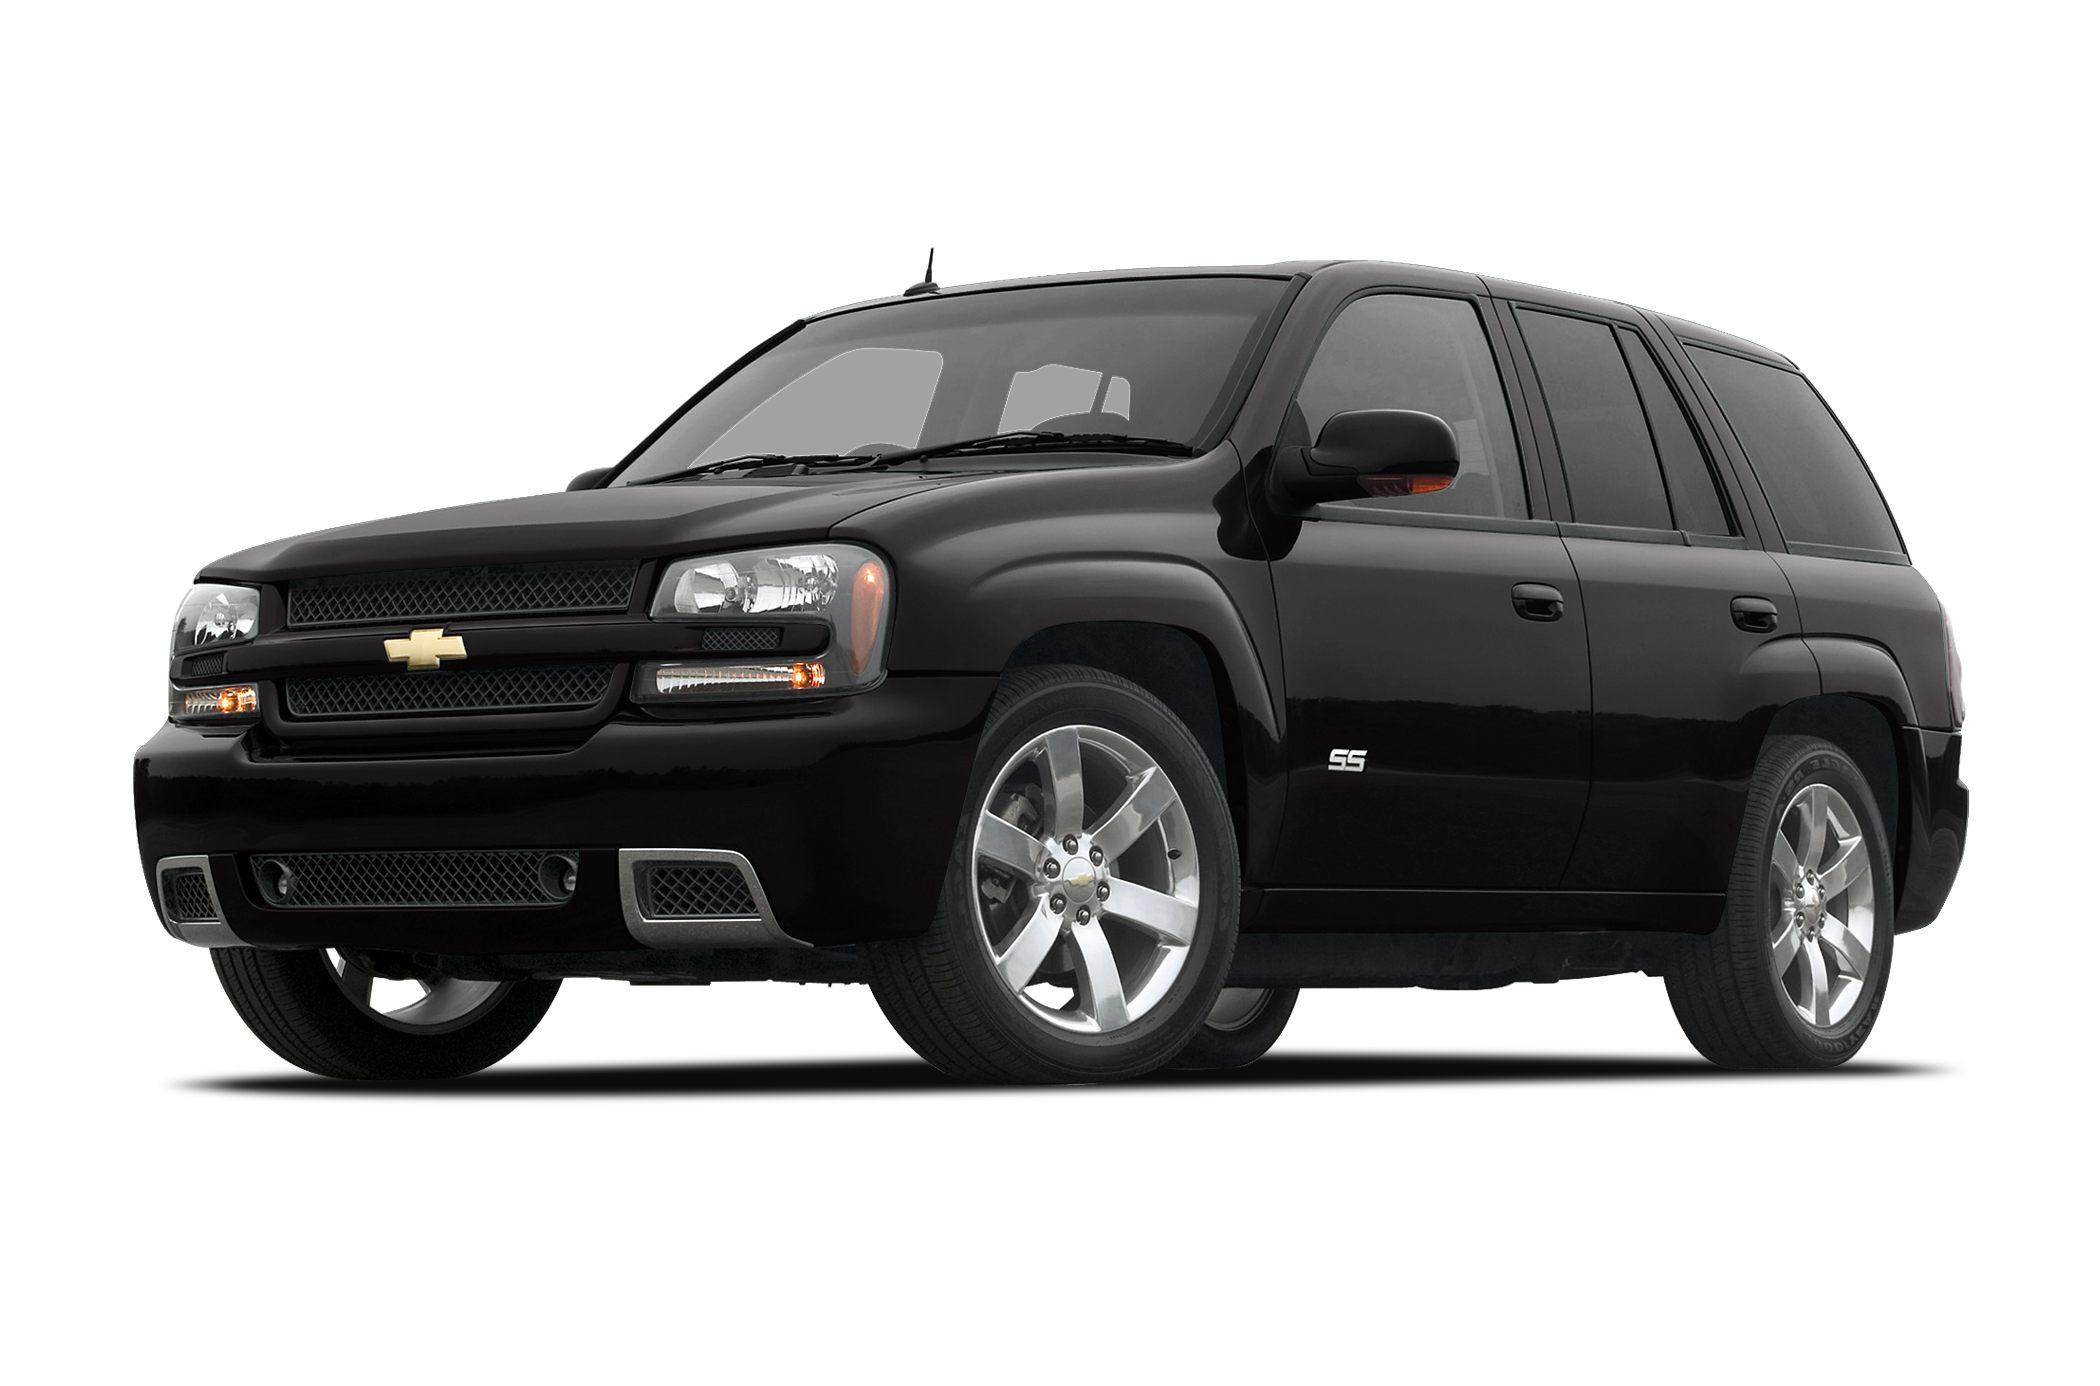 2008 Chevrolet TrailBlazer SS SUV for sale in Hooksett for $17,899 with 87,204 miles